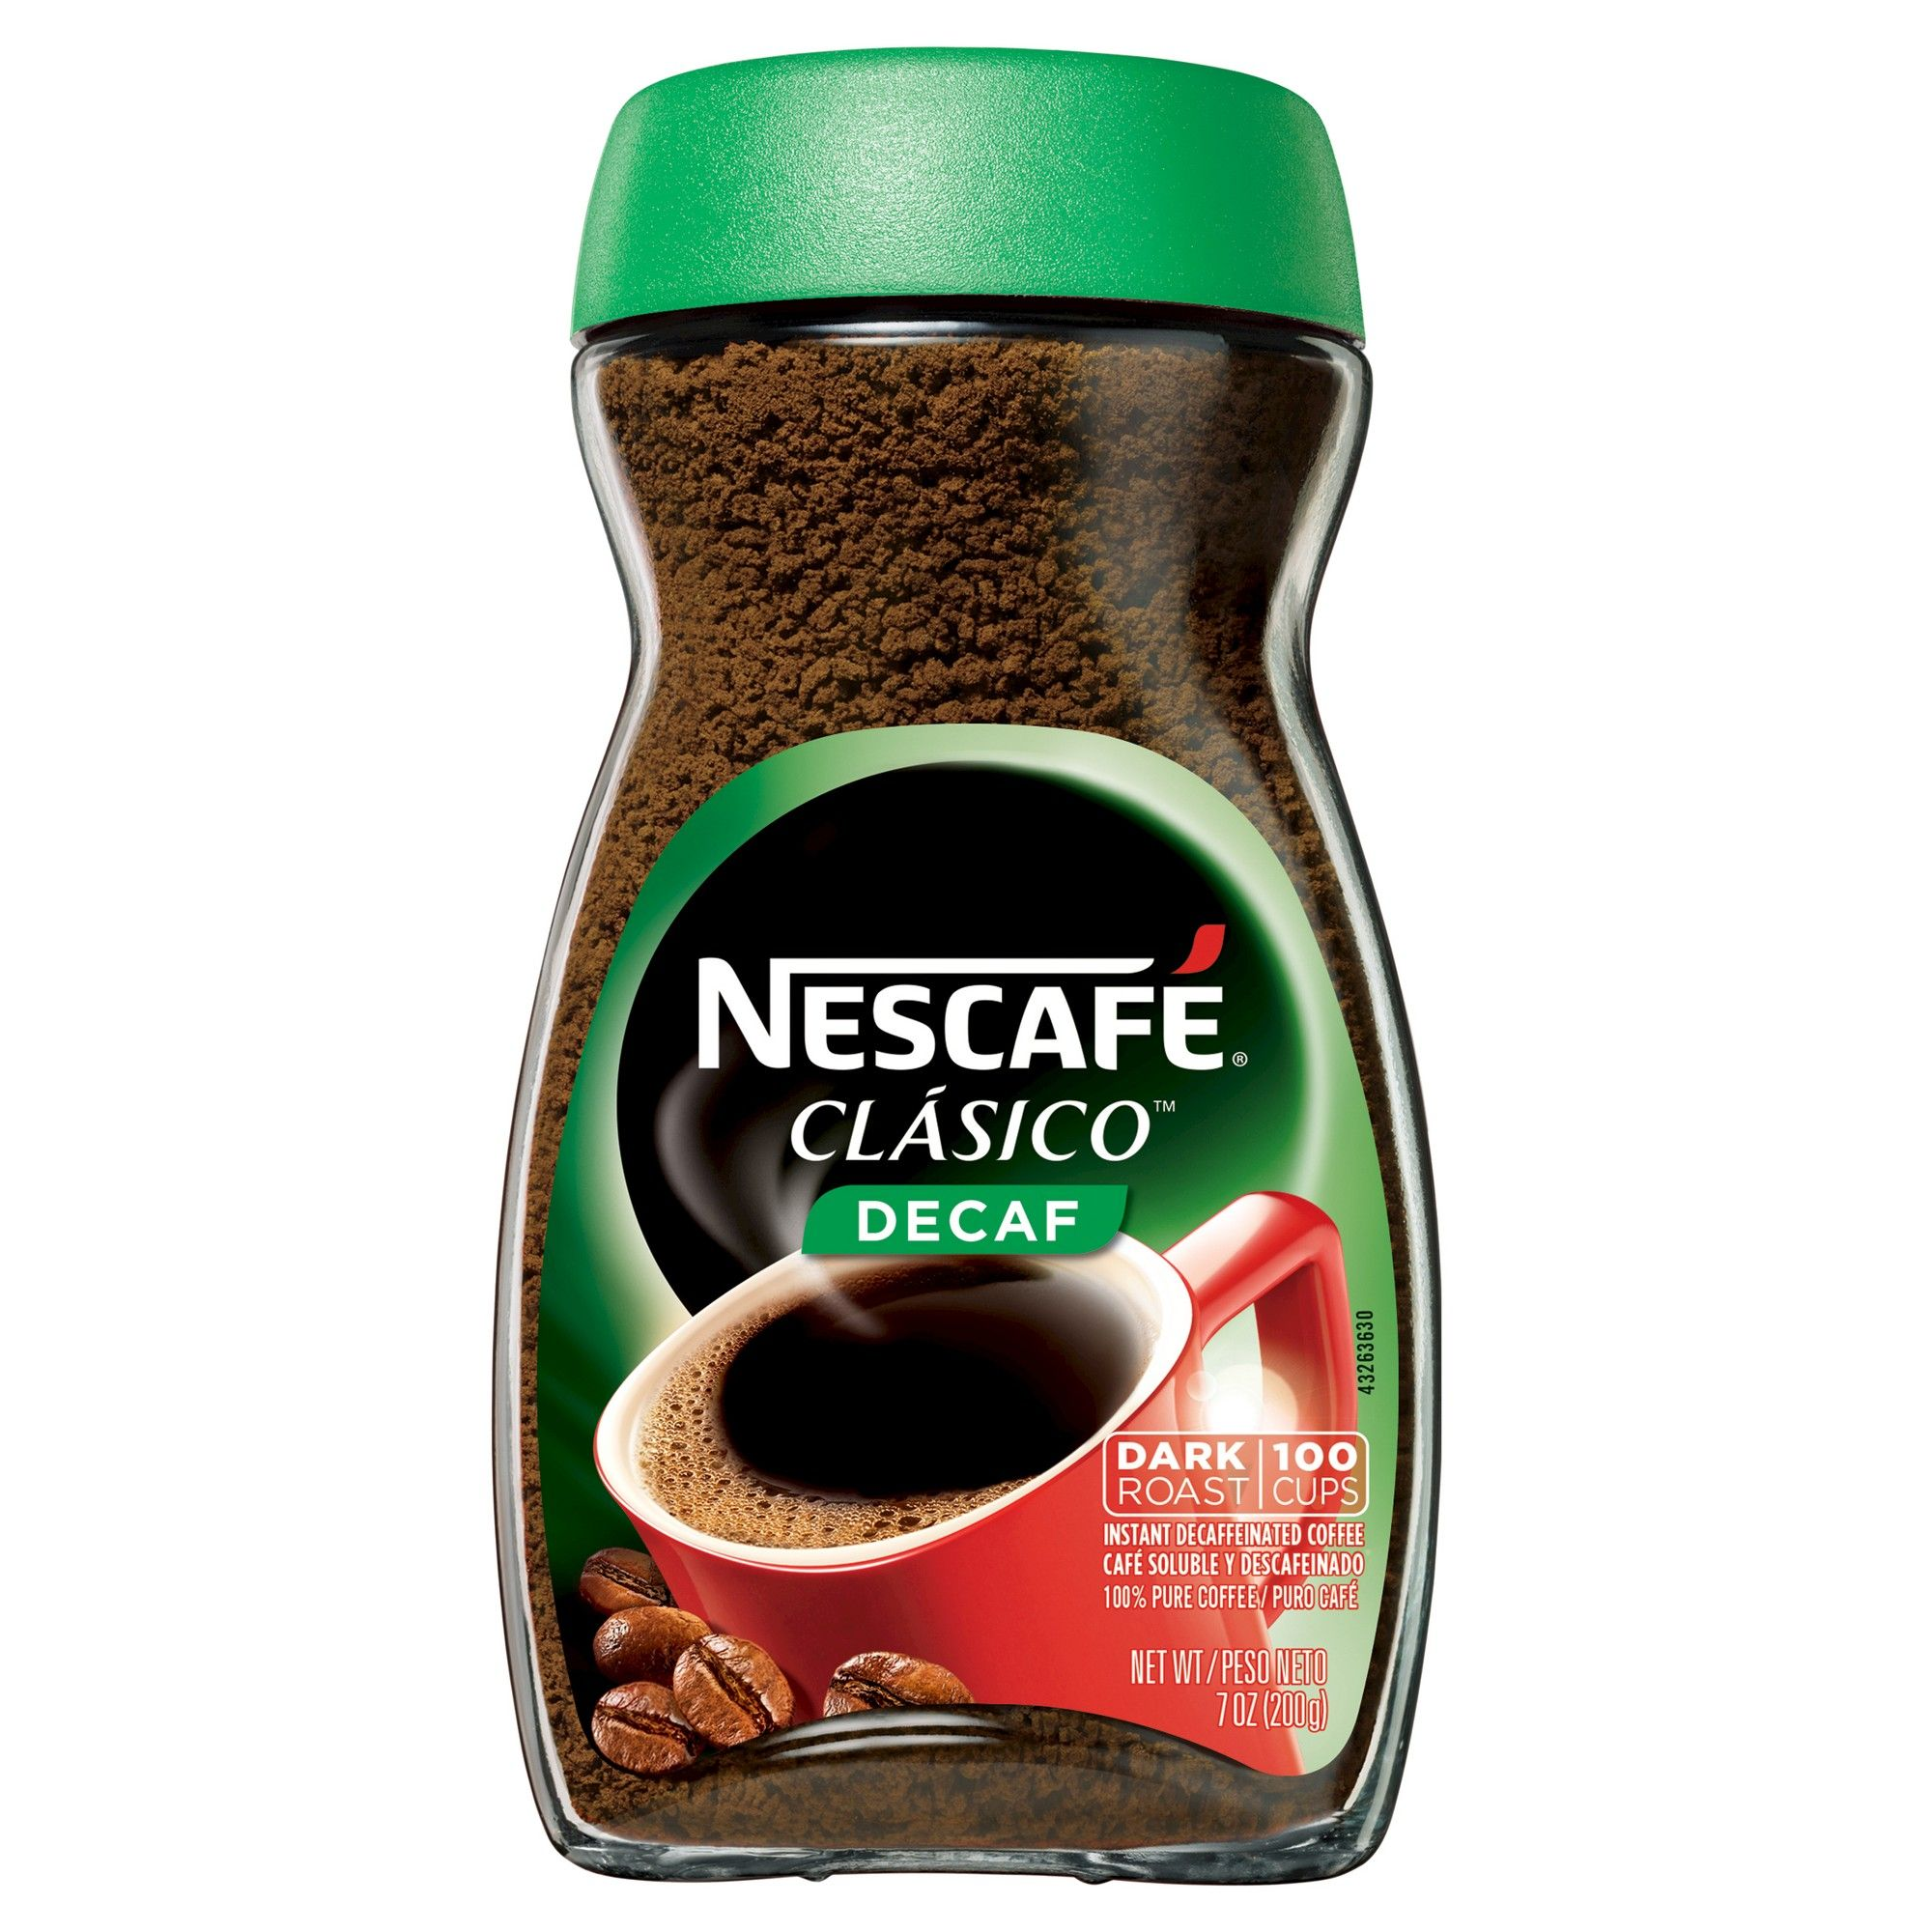 Nescafé Clasico Dark Roast Instant Coffee Decaf 7oz